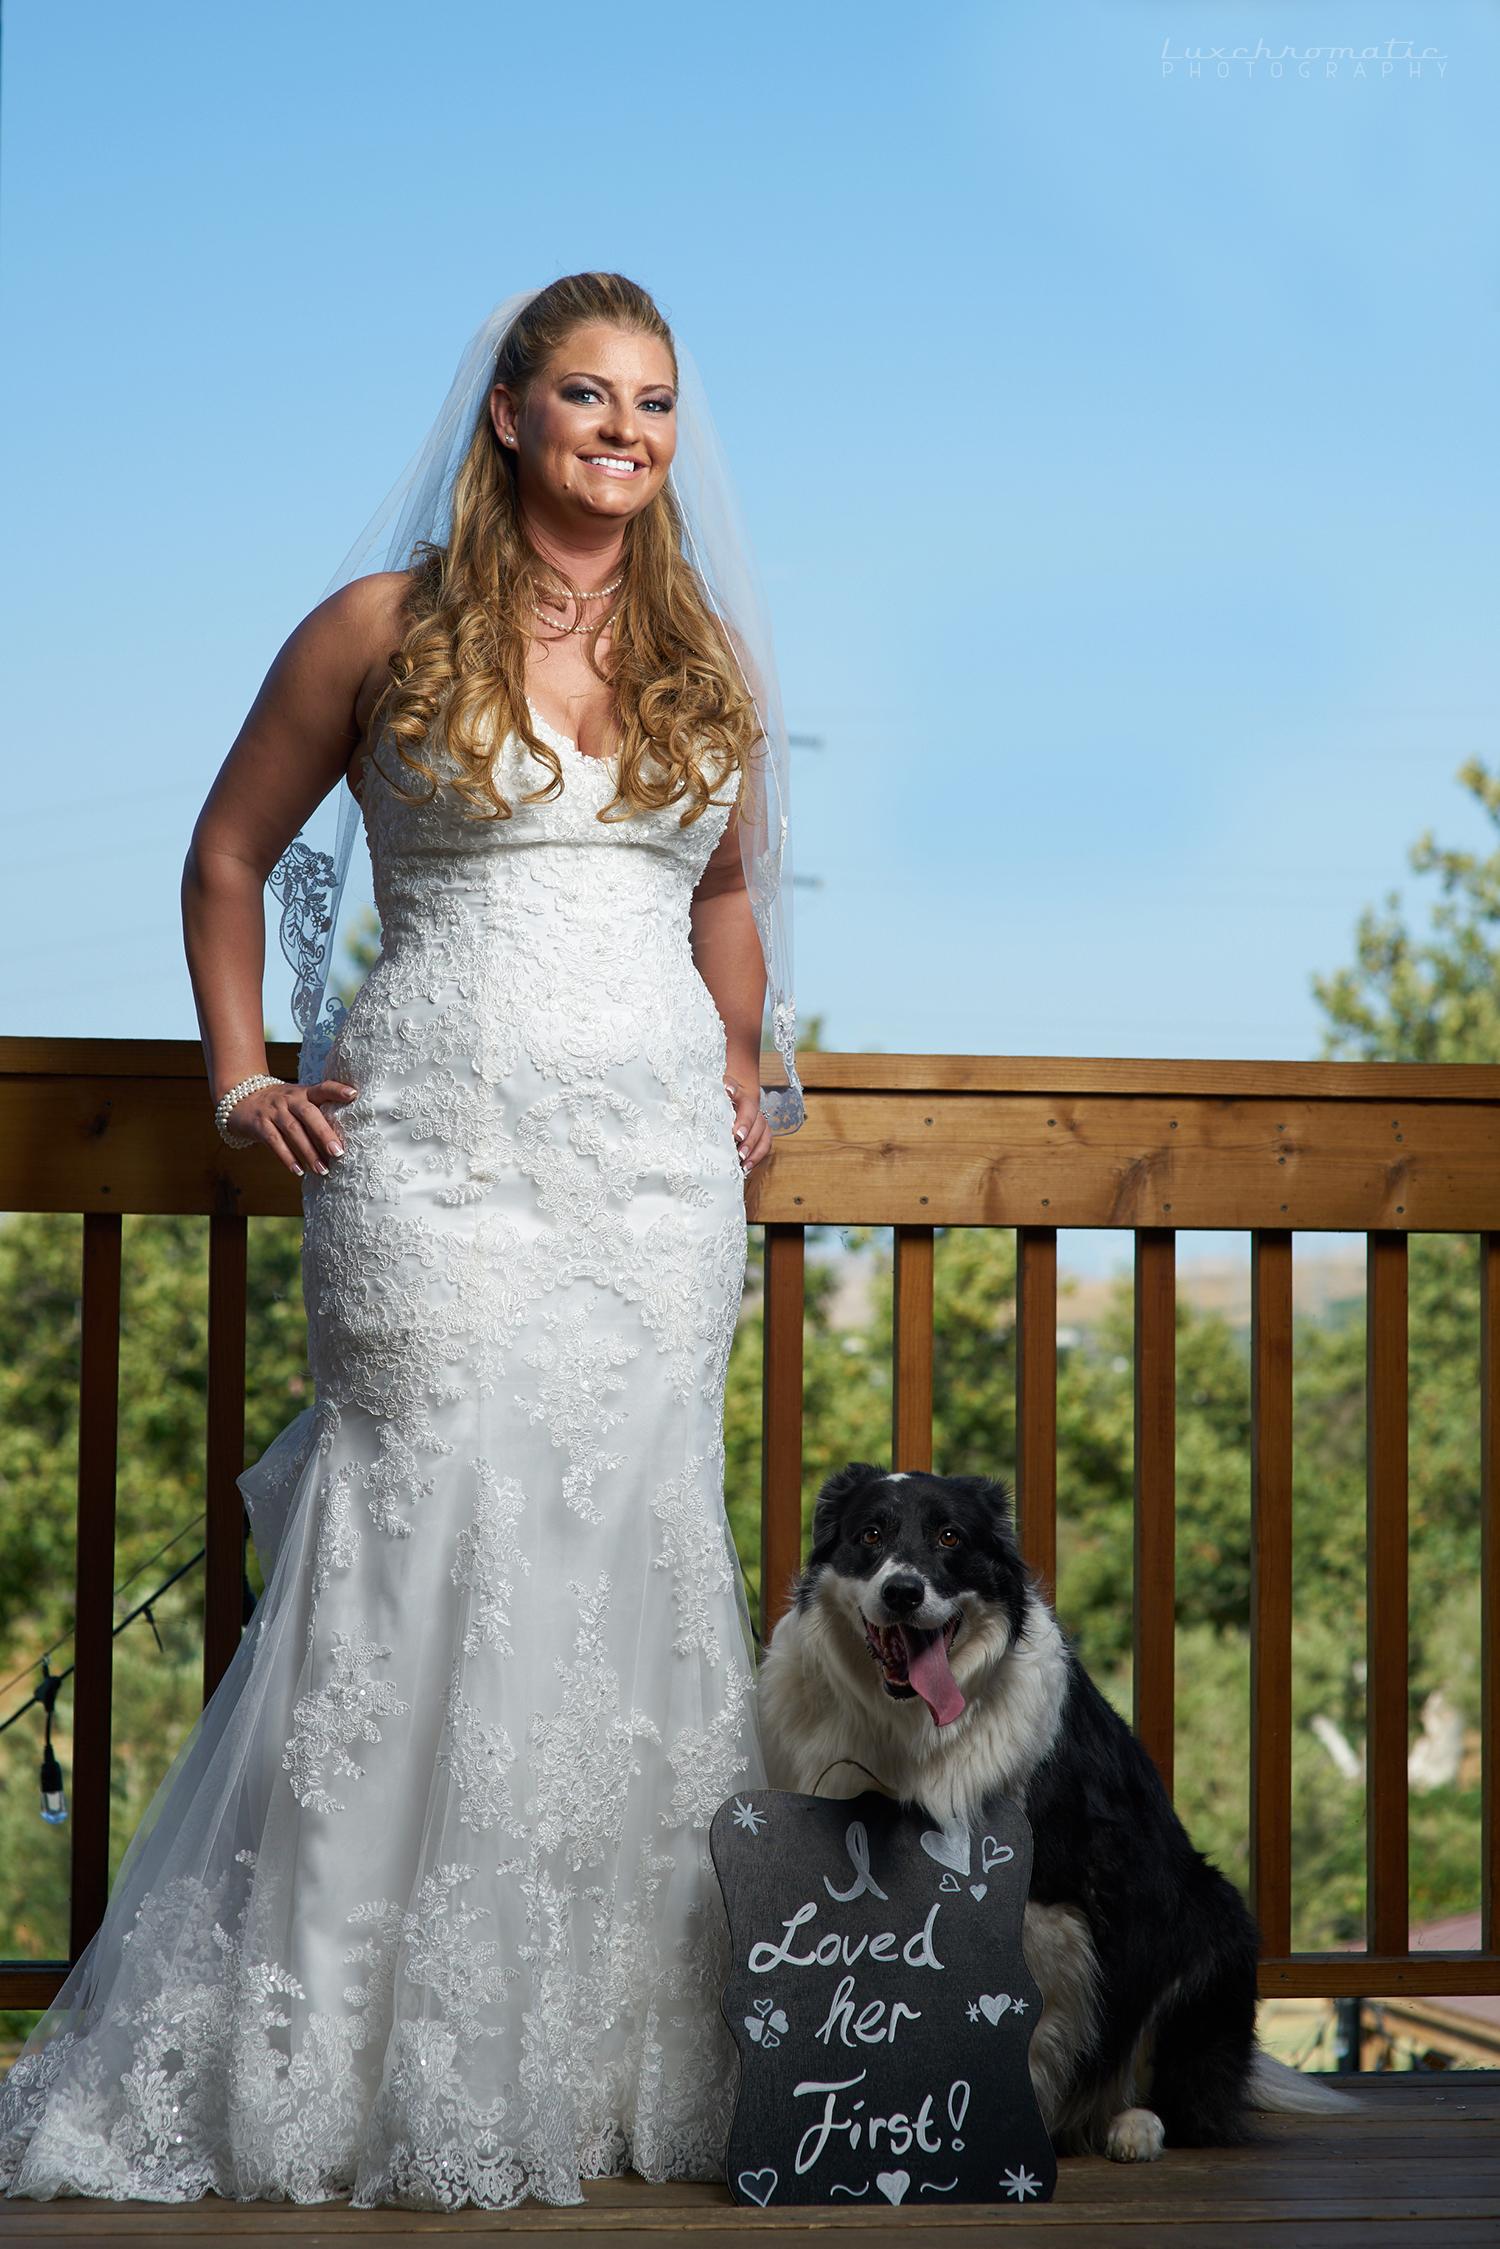 081217_Rachel_Chris_a0254-weddingdress-bride-weddingphotography-weddingphotographer-bridal-groom-wedding-engagementring-proposal-brides-diamondring-sonyalpha-sony-sonya9-sonya7rii-sanfrancisco-sf-bayarea-photographer-profoto-murrietas-well.jpg